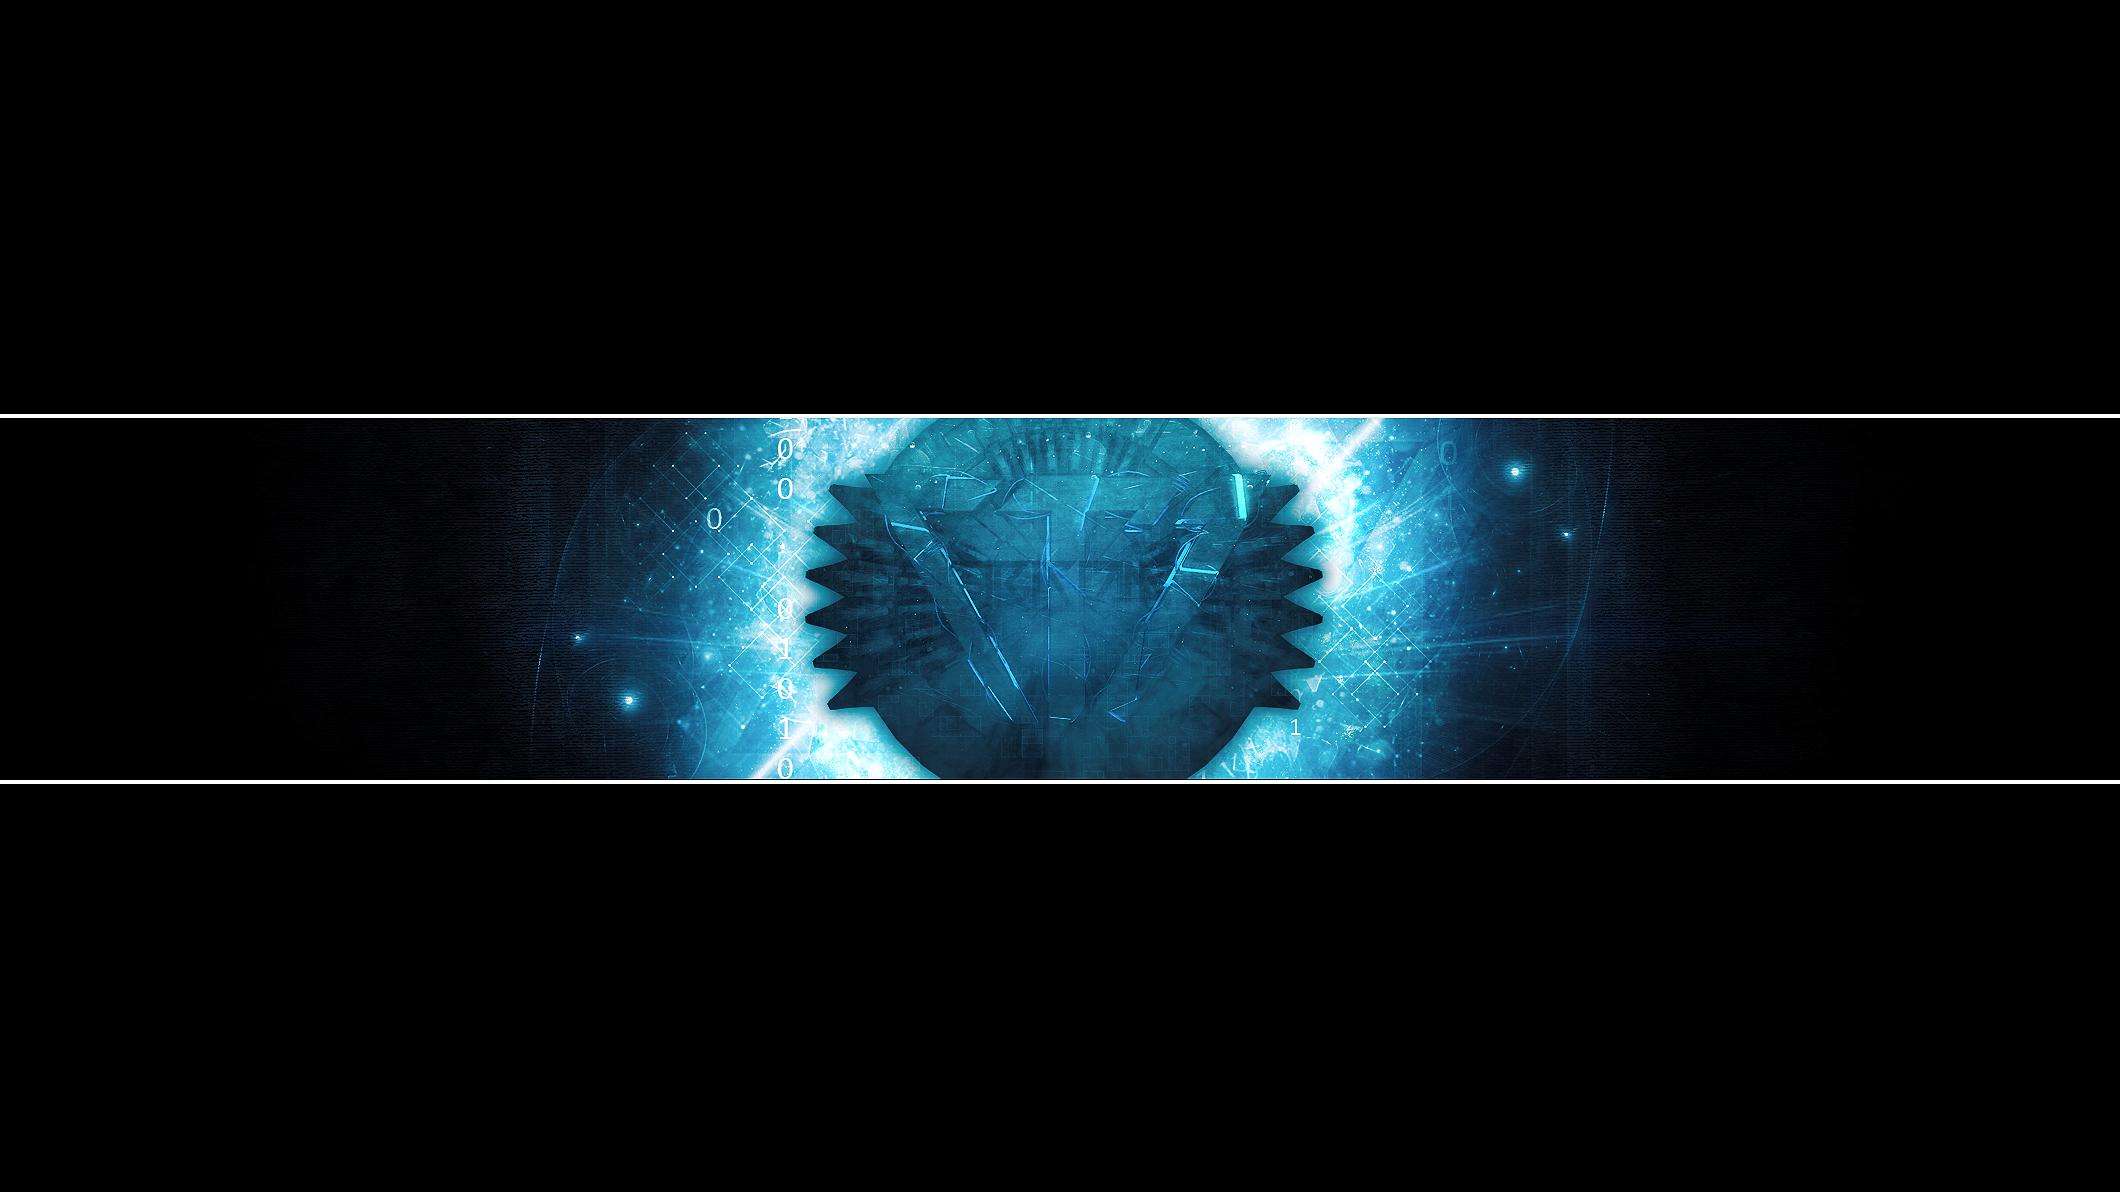 Unduh 900 Background Banner Yt HD Terbaru